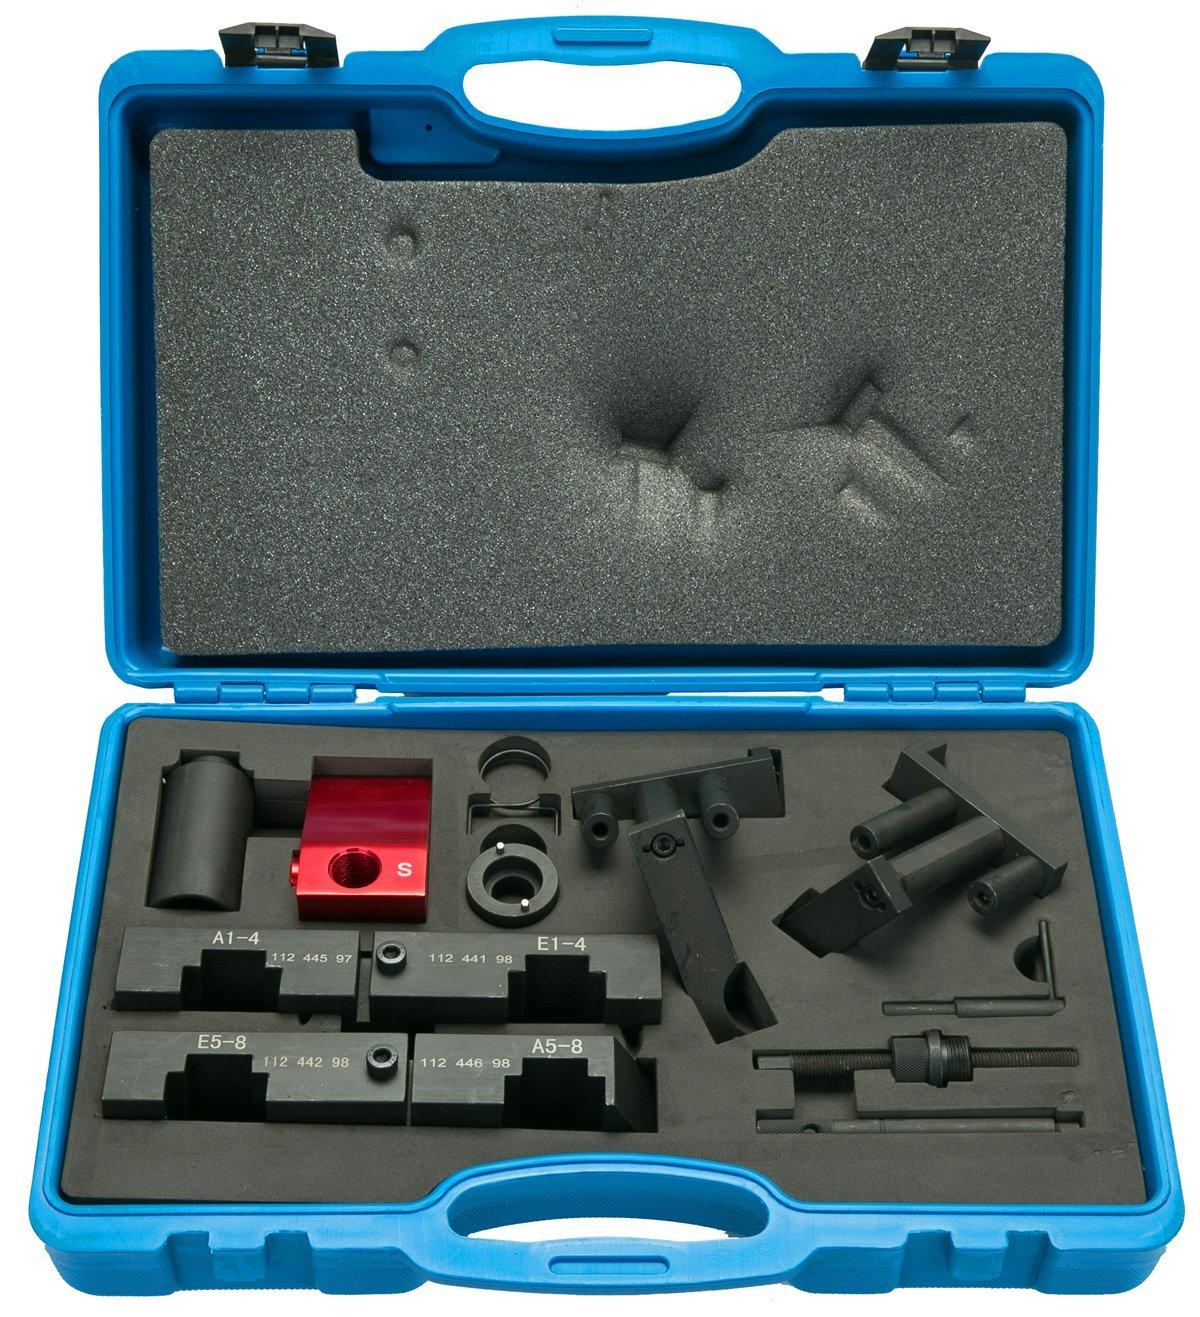 8MILELAKE Camshaft Alignment VANOS Timing Locking Tool Kit Compatible for BMW M60/M62 by 8MILELAKE (Image #1)